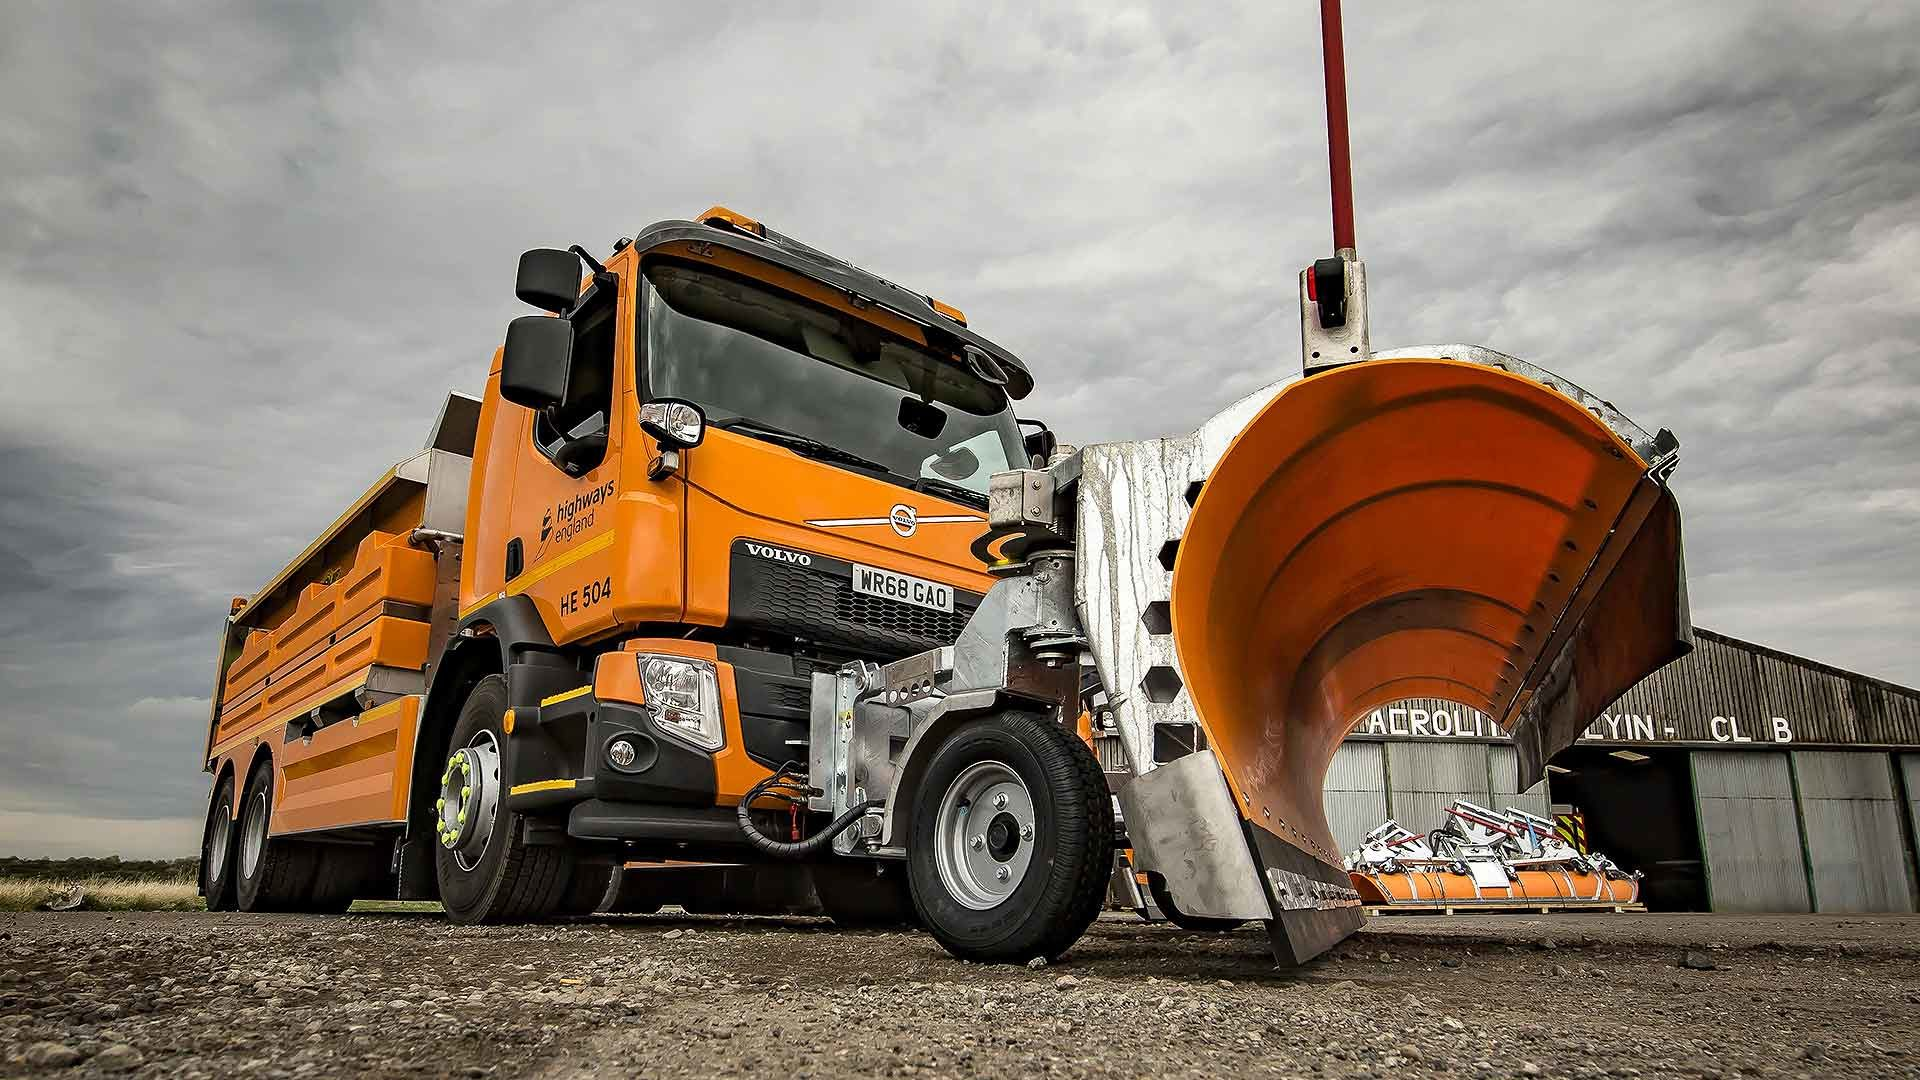 Highways England's high-tech new road gritter